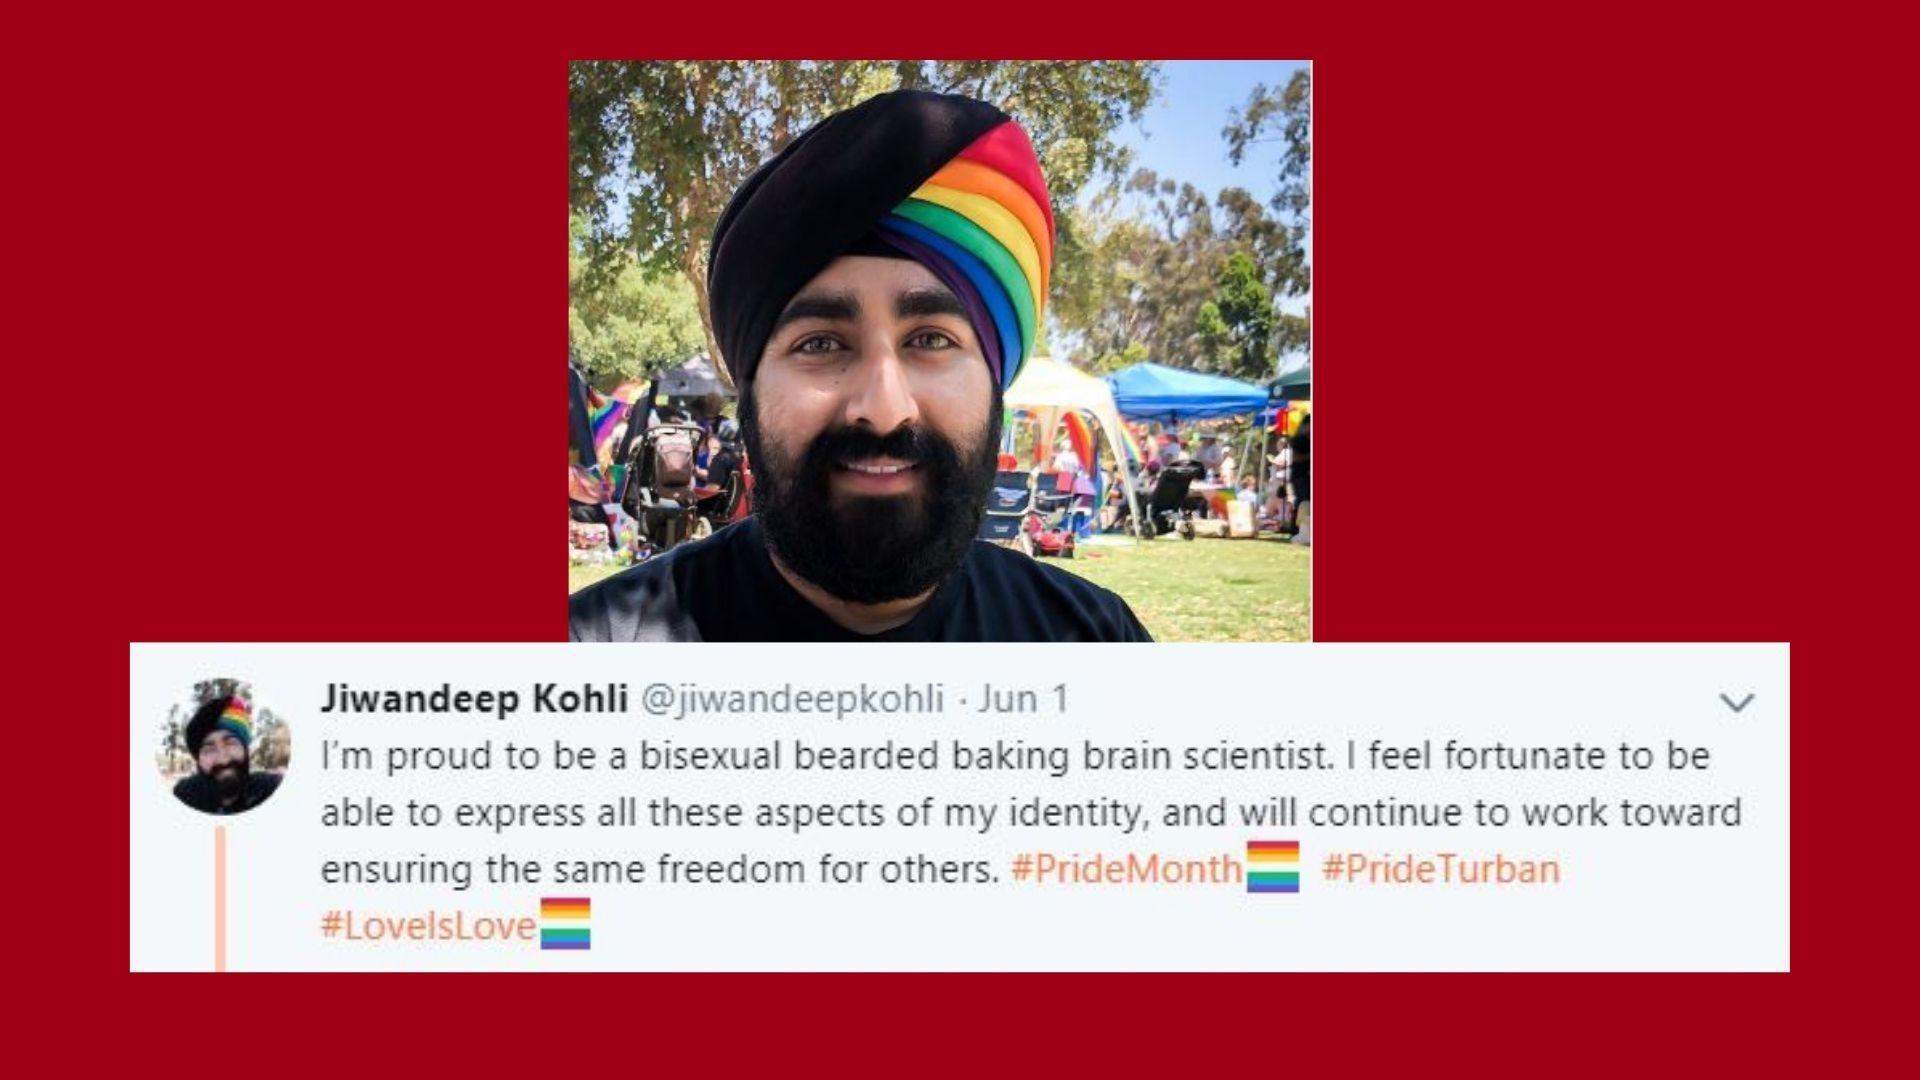 Photo of Sikh mans fantastic rainbow turban for gay pride